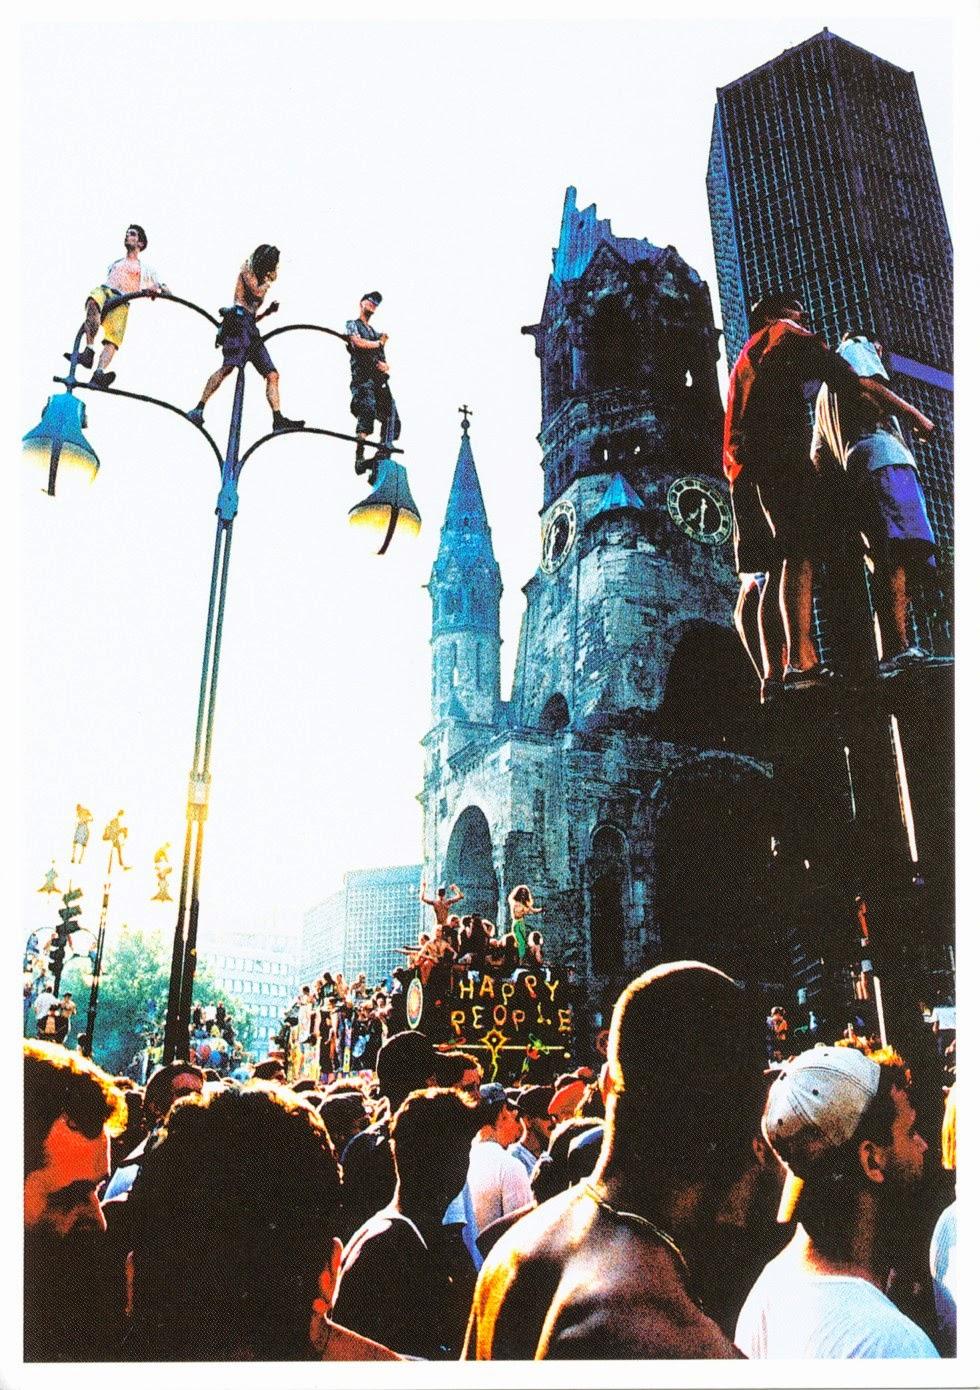 psotcard, germany, kaiser wilhelm memorial church, love parade, techno, festival